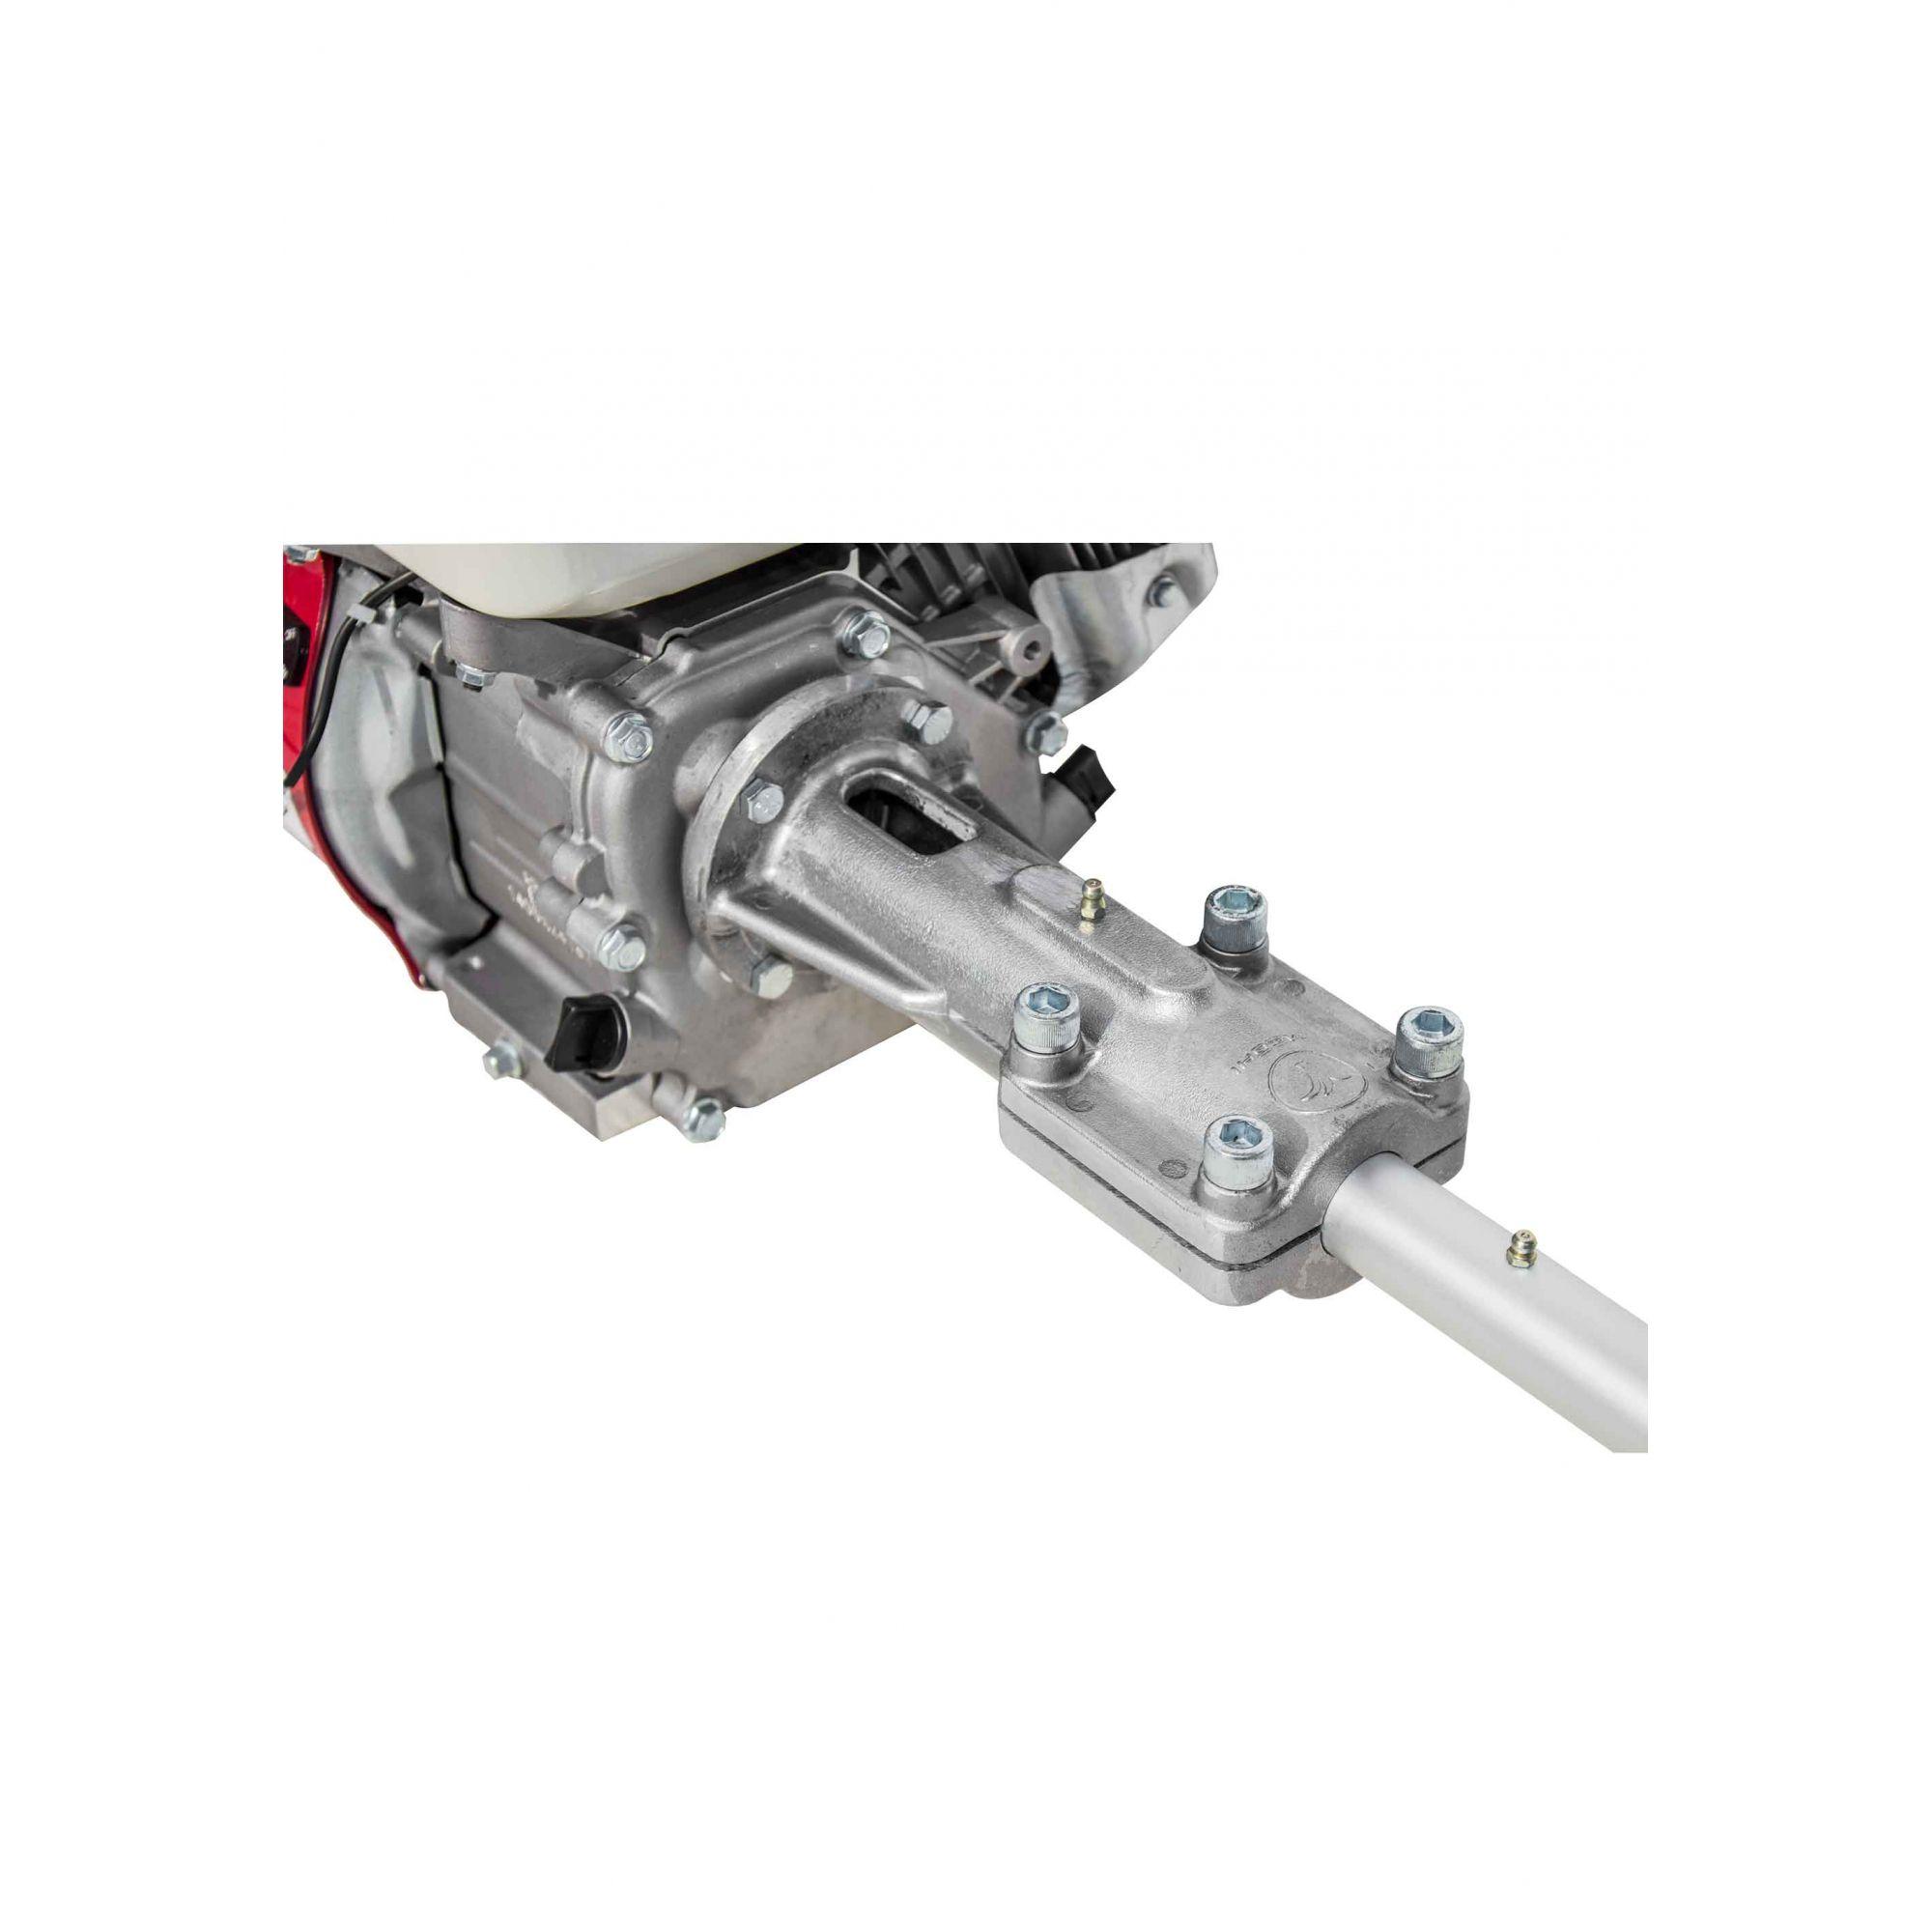 Kit Motor De Centro Barco Bote 1,70mt Motor 15/20hp Gasolina